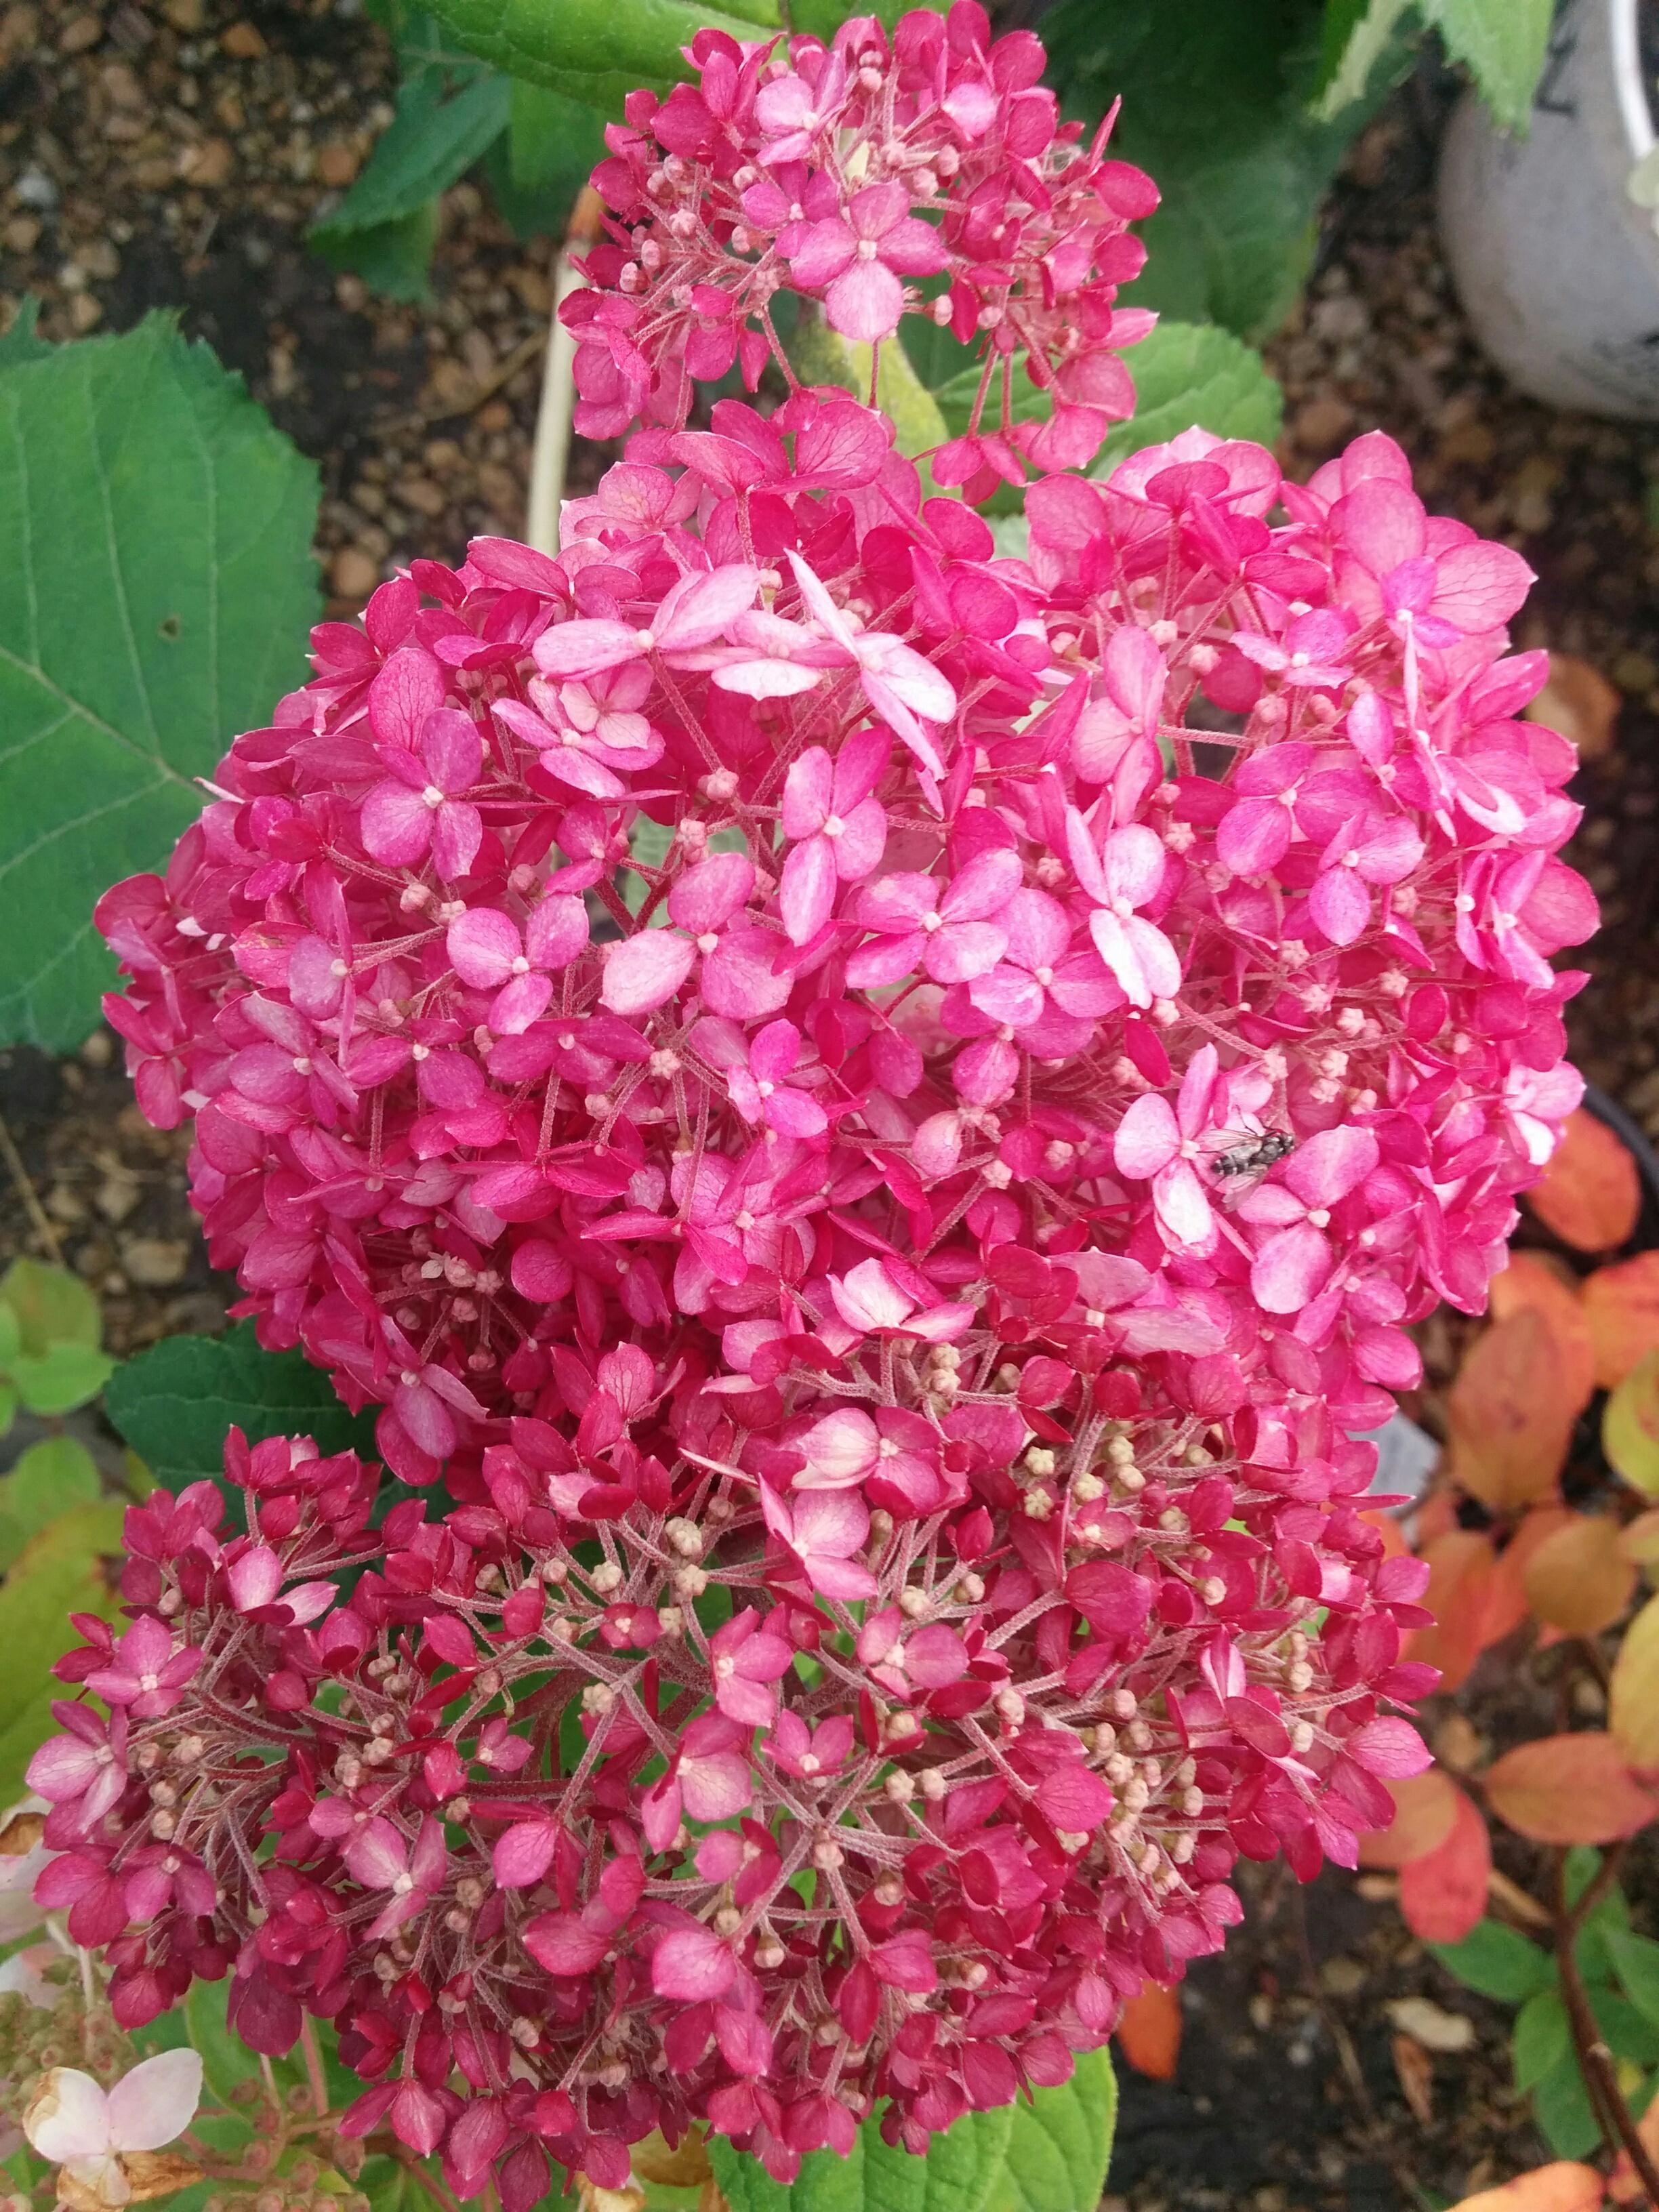 Invincibelle Hydrangea Flower Close Up